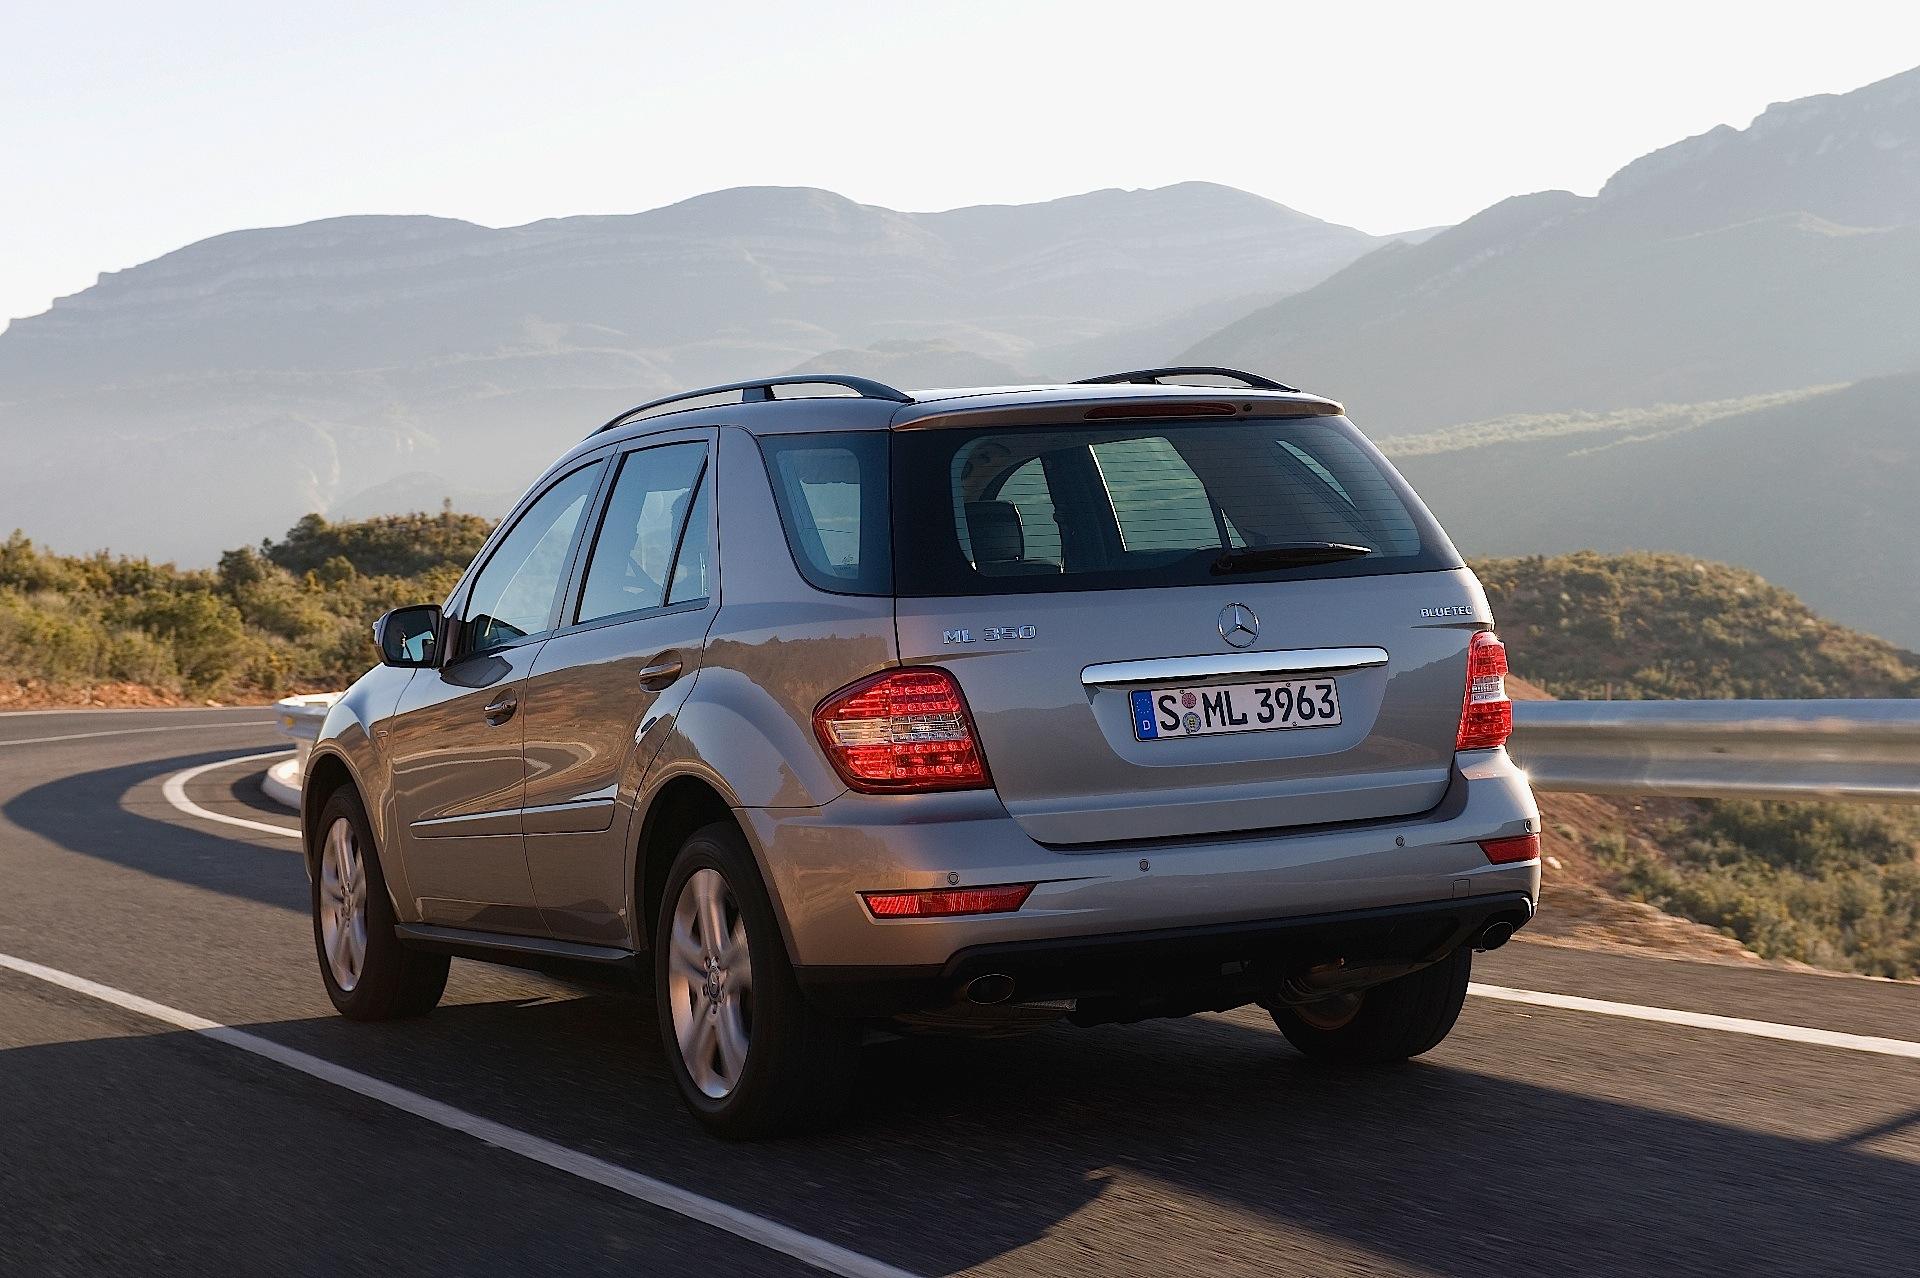 trunk mercedesbenz mercedes benz europe m class launched edition mclass grand news suv in